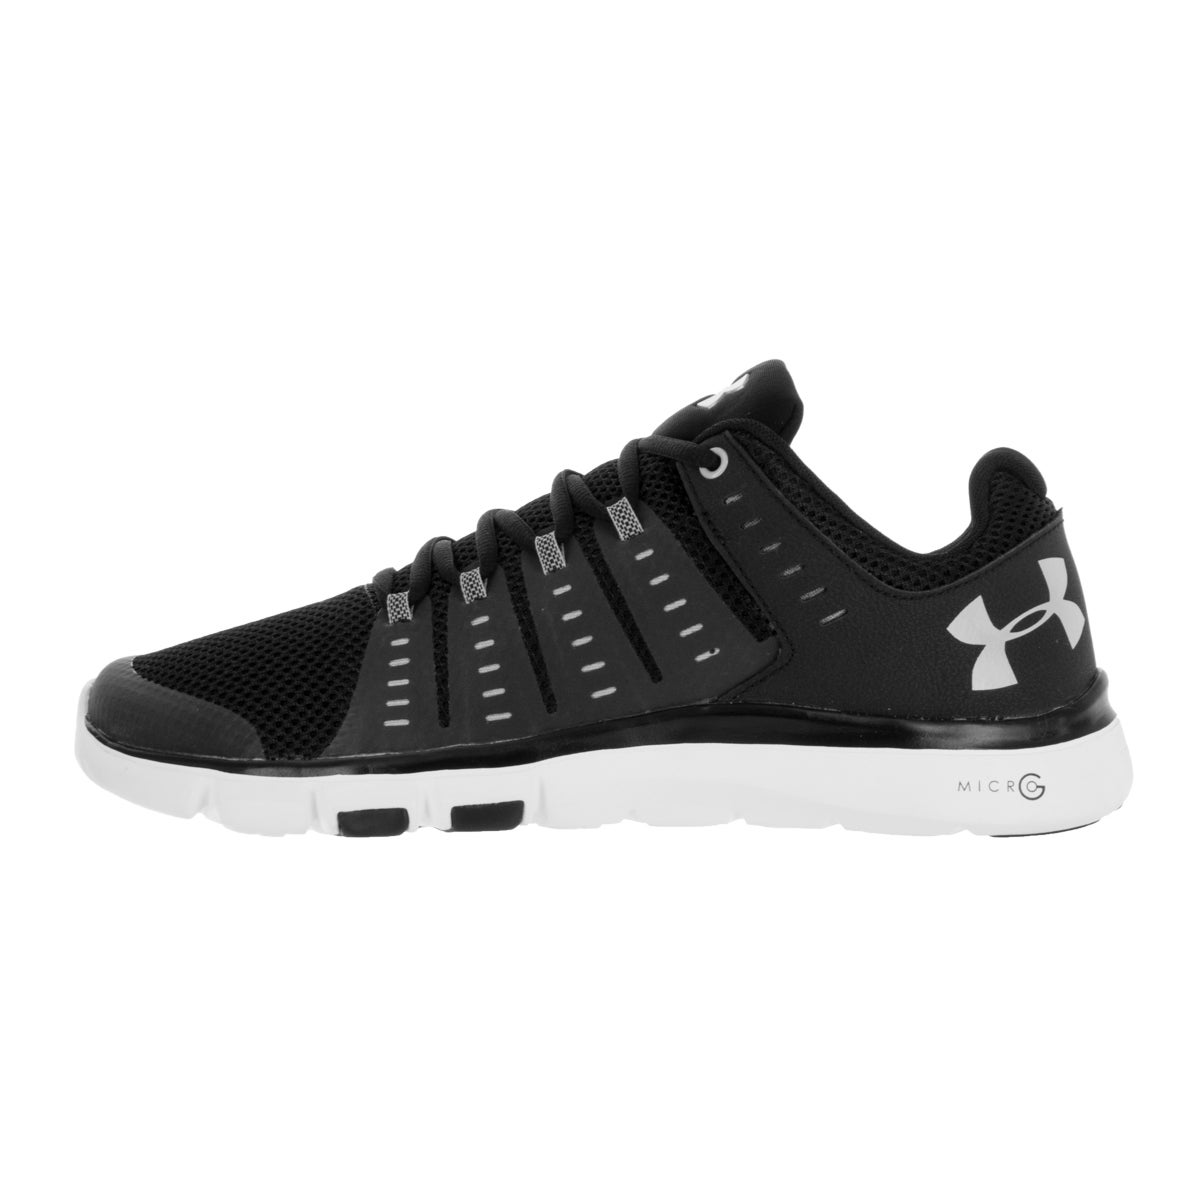 huge selection of d9adf dedf4 Under Armour Men's UA Micro G Limitless Tr 2 BlackTraining Shoe